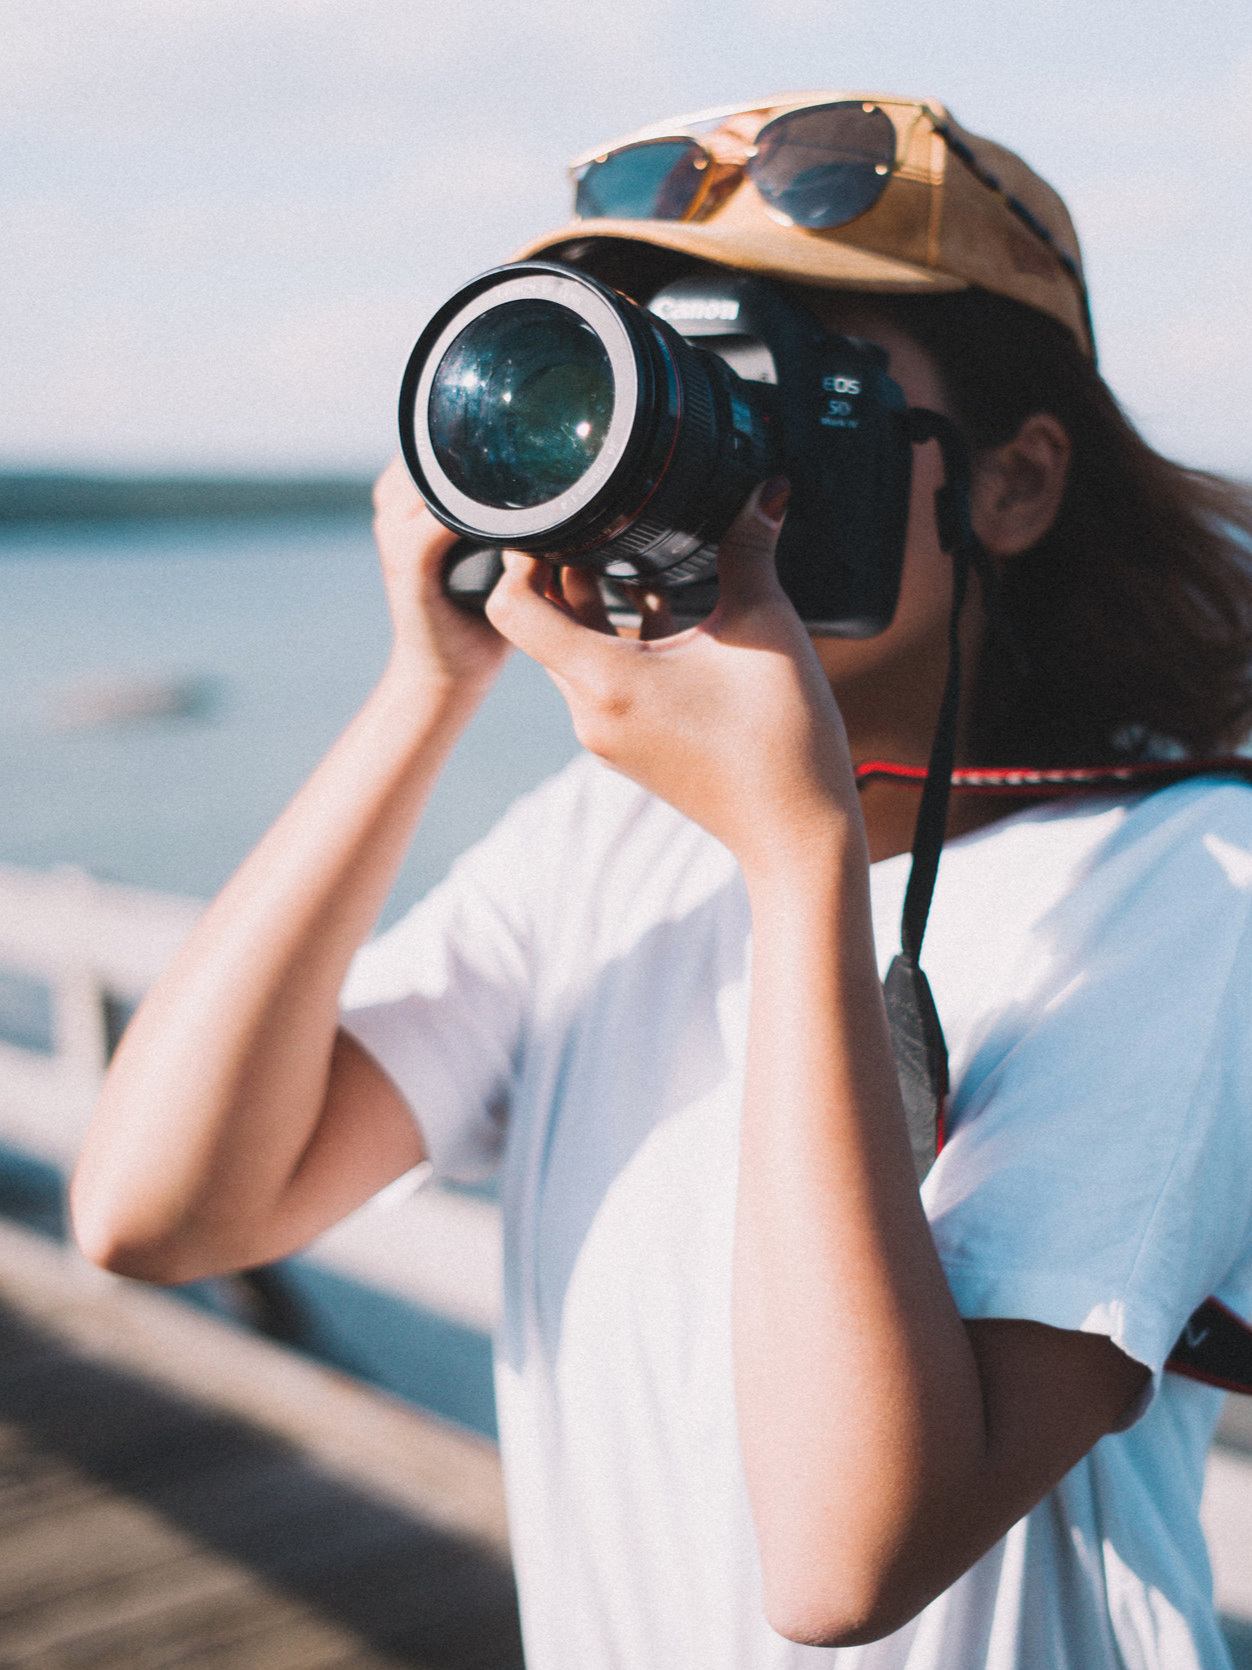 photography videography kol.jpg